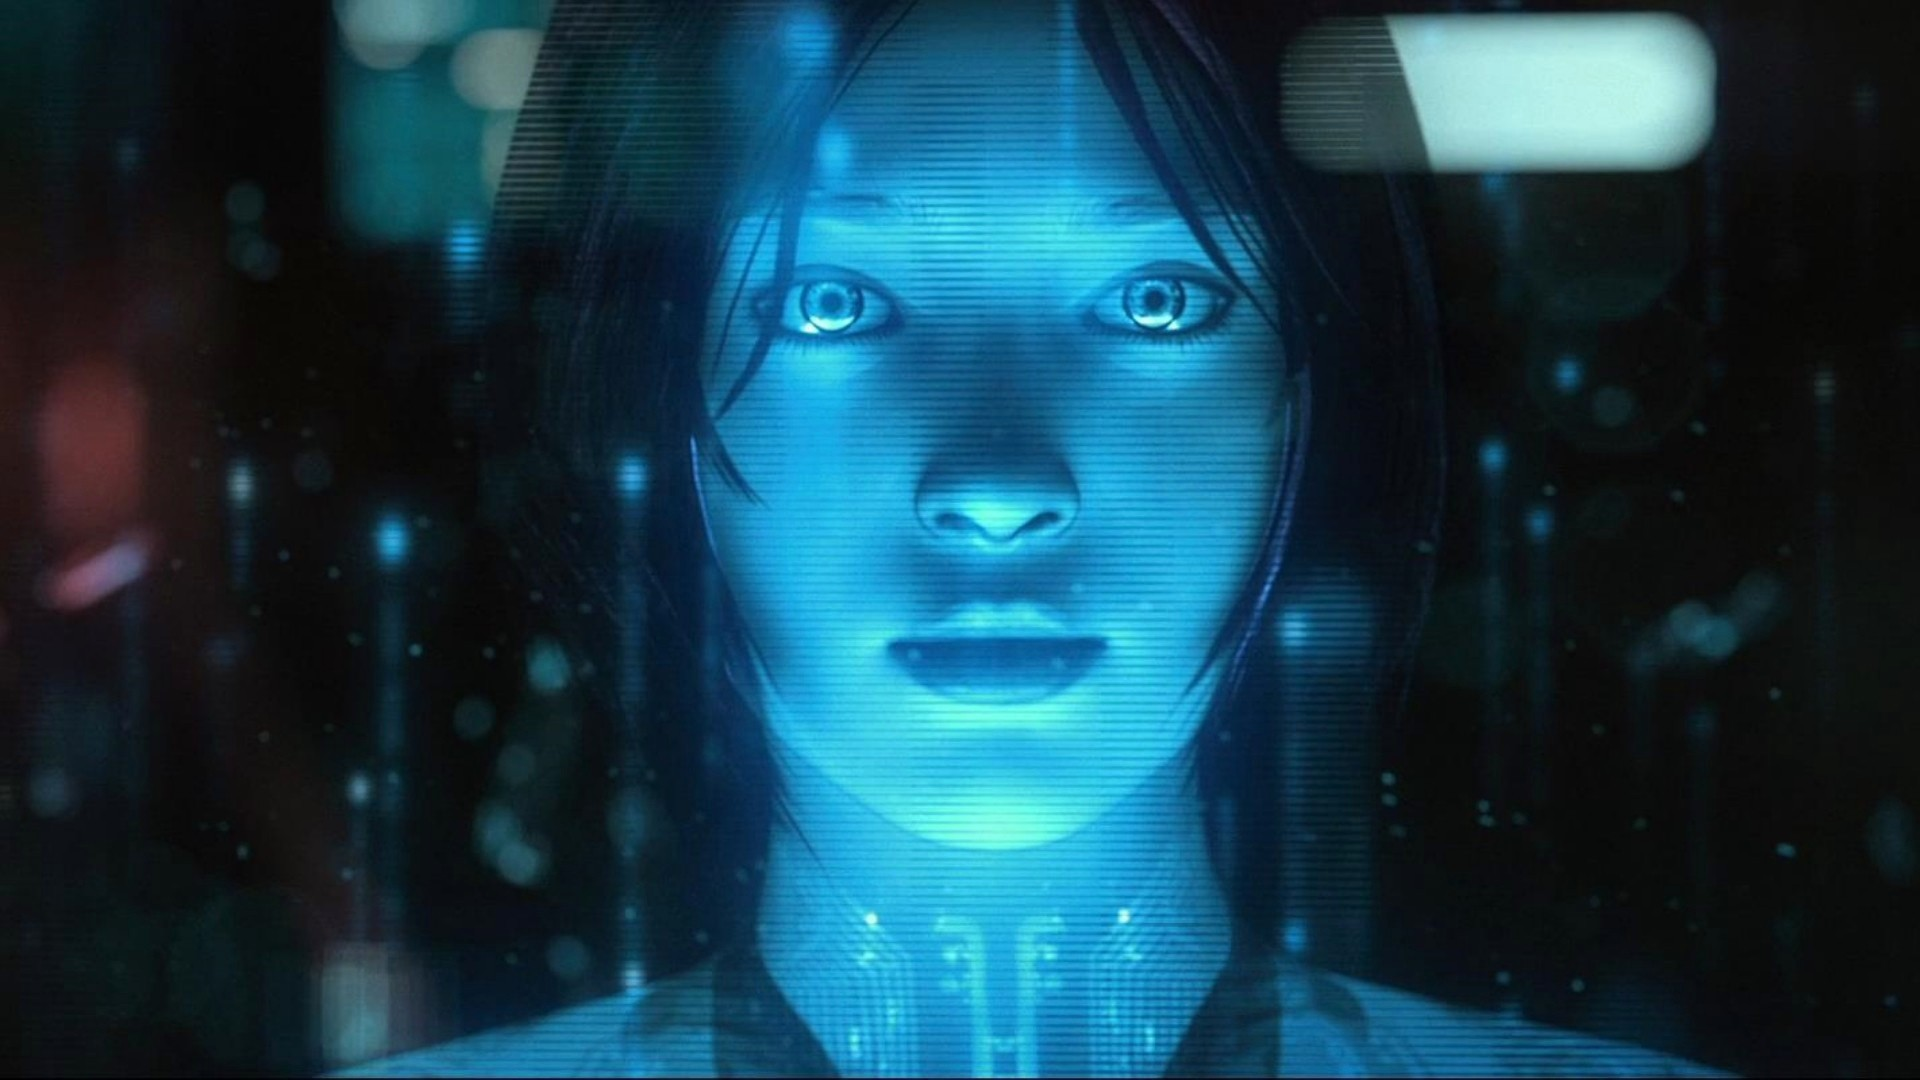 Cortana Animated Wallpaper Windows 10 71 images 1920x1080